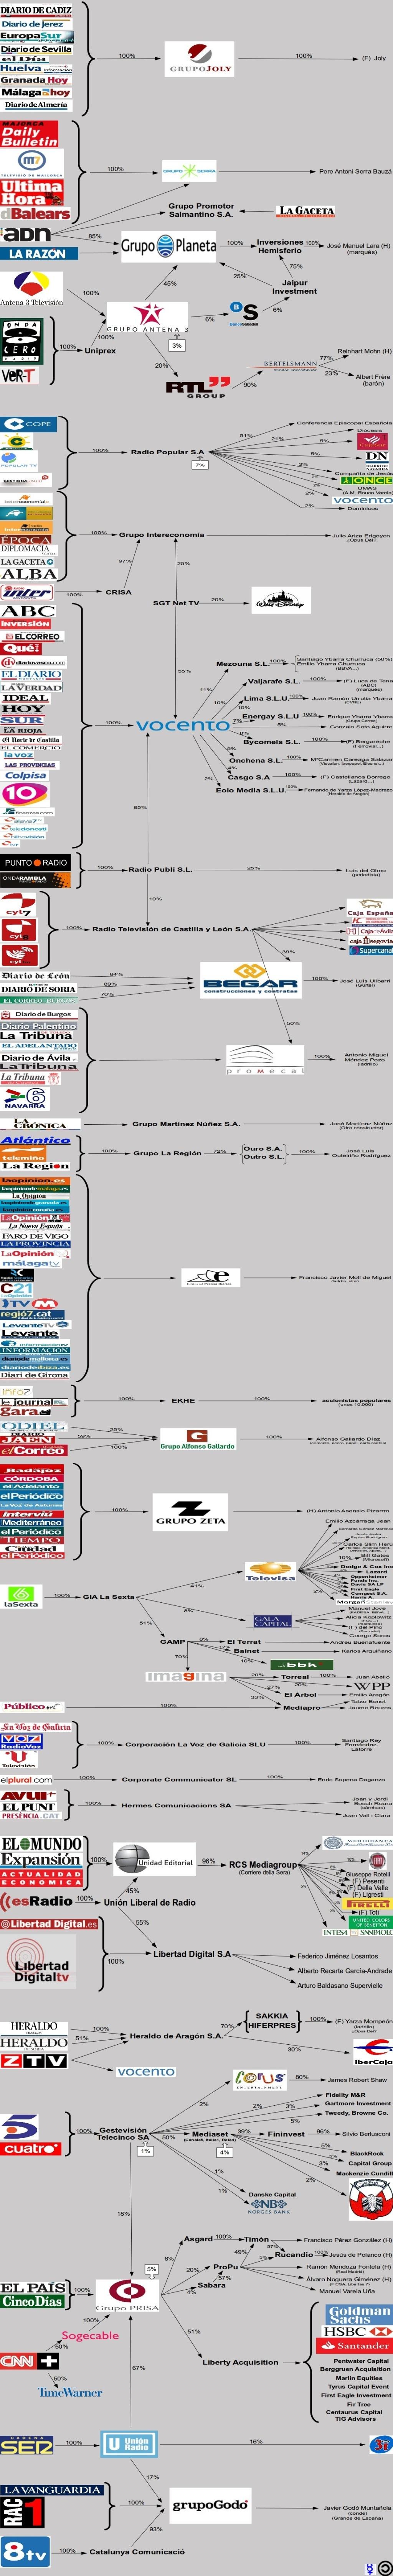 http://esmola.files.wordpress.com/2010/11/final93copyleft.jpg?w=1024&h=6720